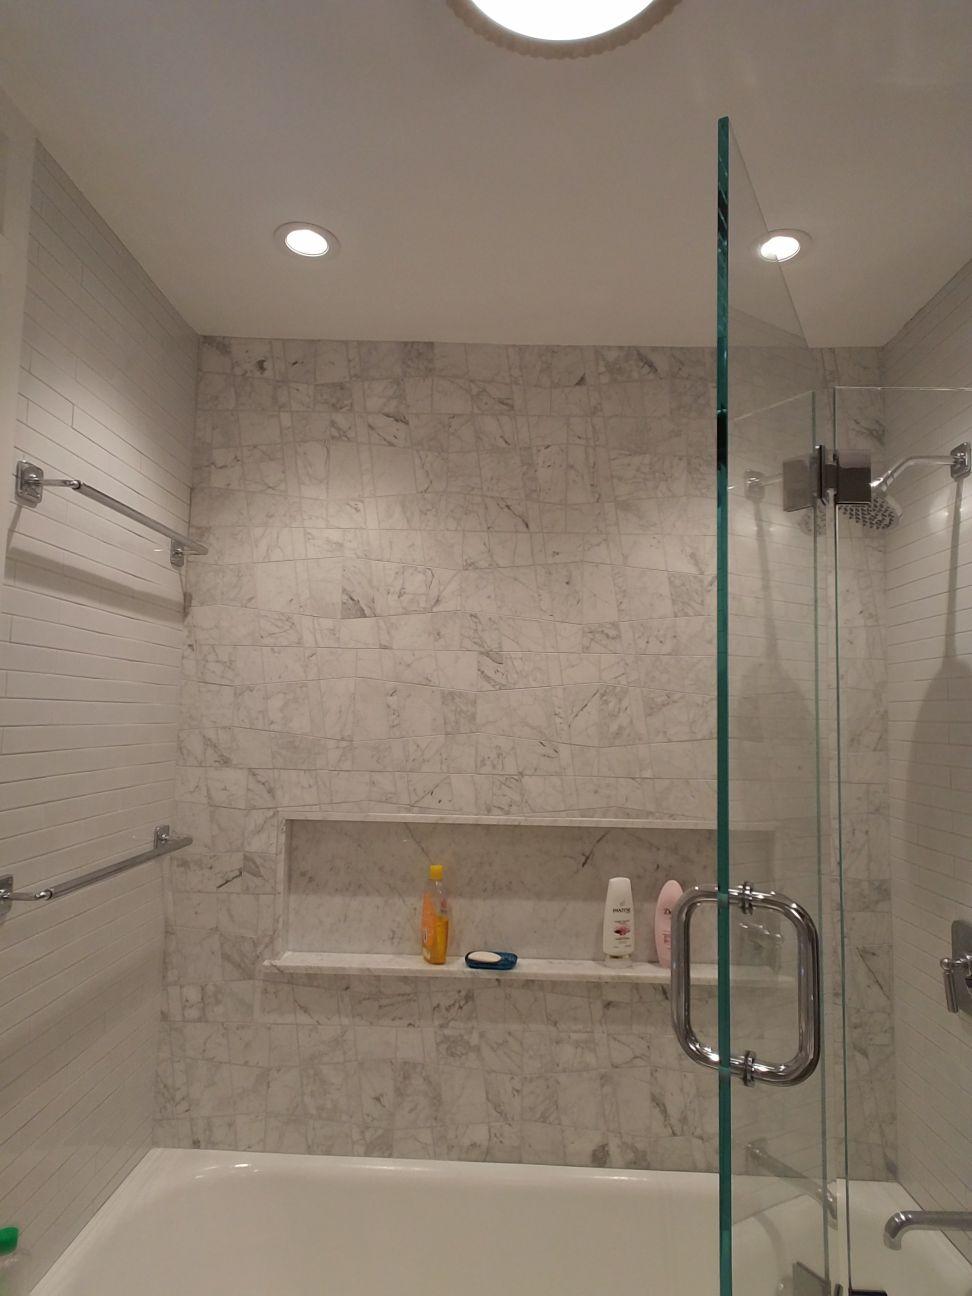 Bathroom 8.19.31 PM.jpeg